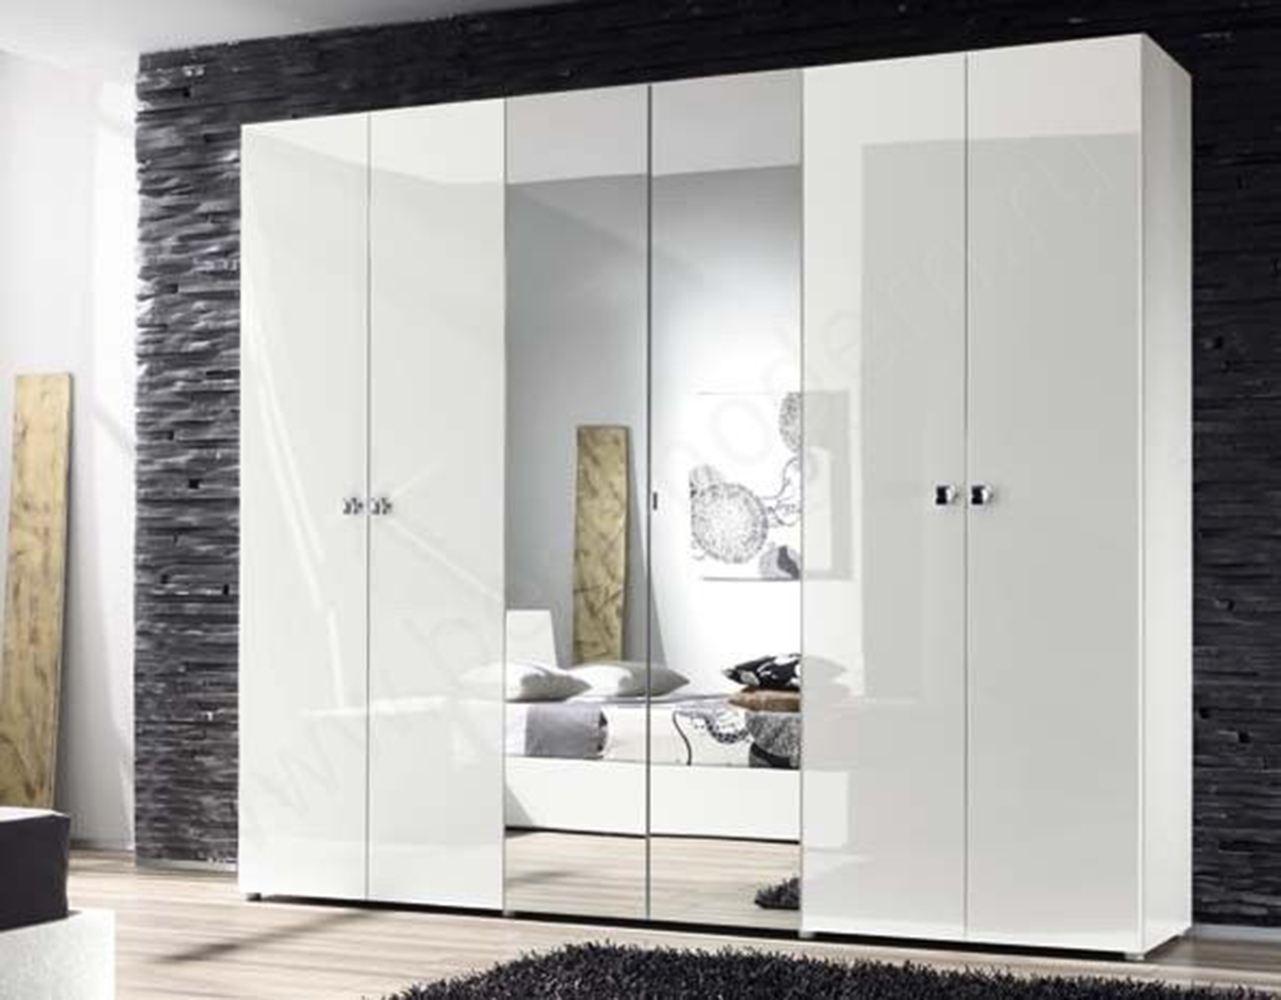 Глянцевый шкаф-купе (54 фото): белый и черный глянец с зерка.